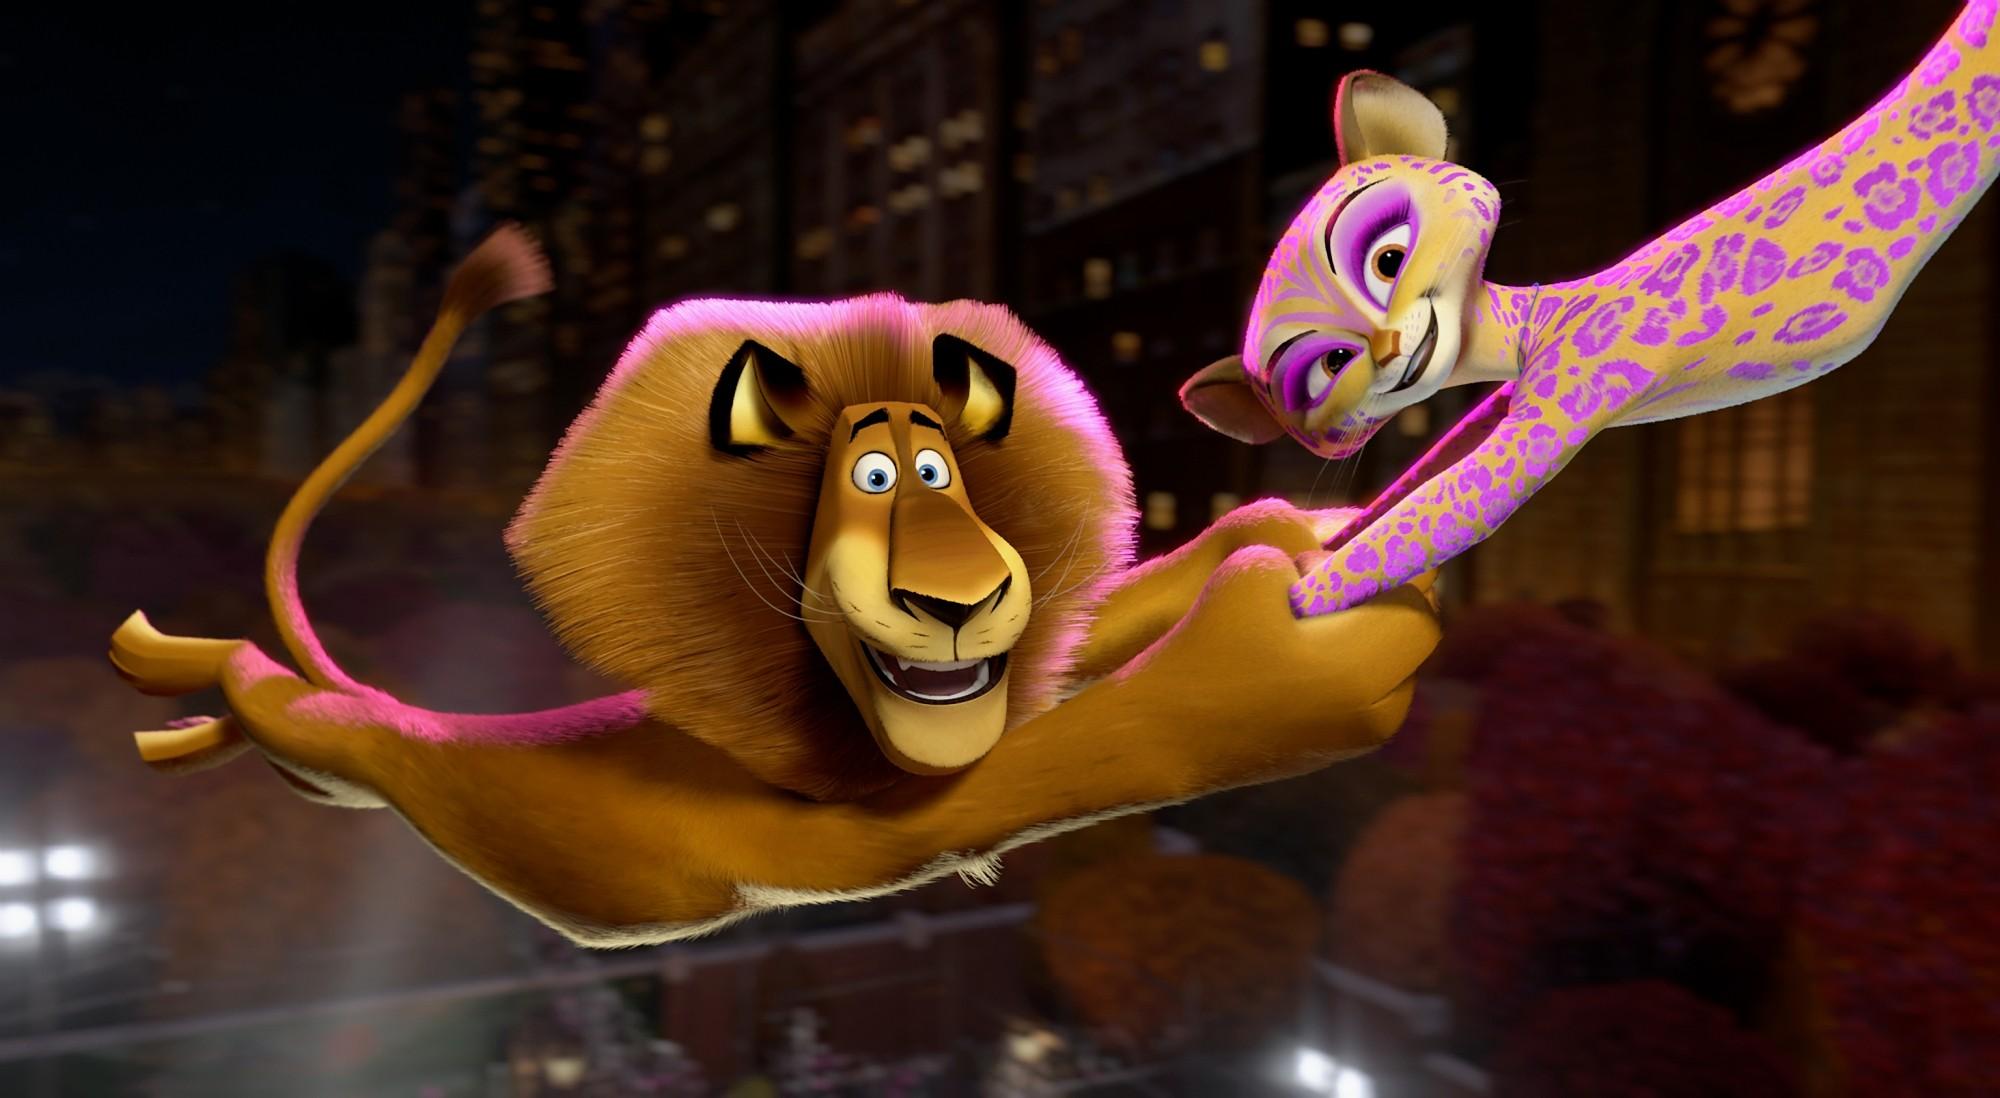 кадры из фильма Мадагаскар 3 в 3D Бен Стиллер, Джессика Честейн,